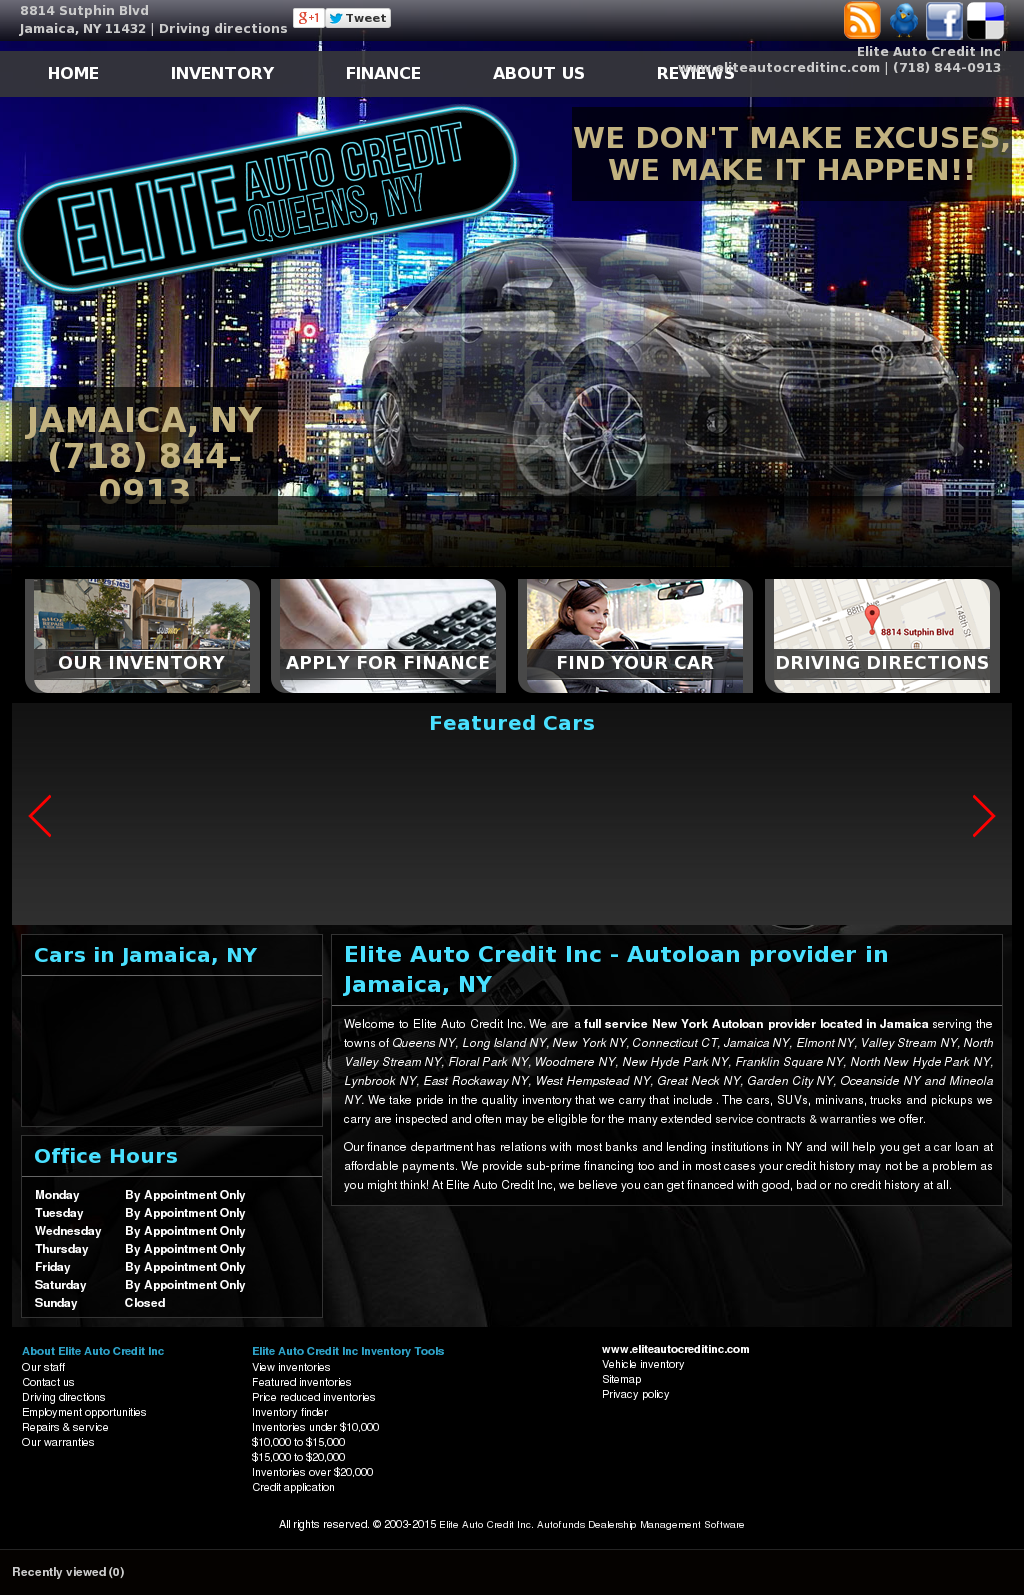 Elite Auto Credit >> Elite Auto Credit Competitors Revenue And Employees Owler Company